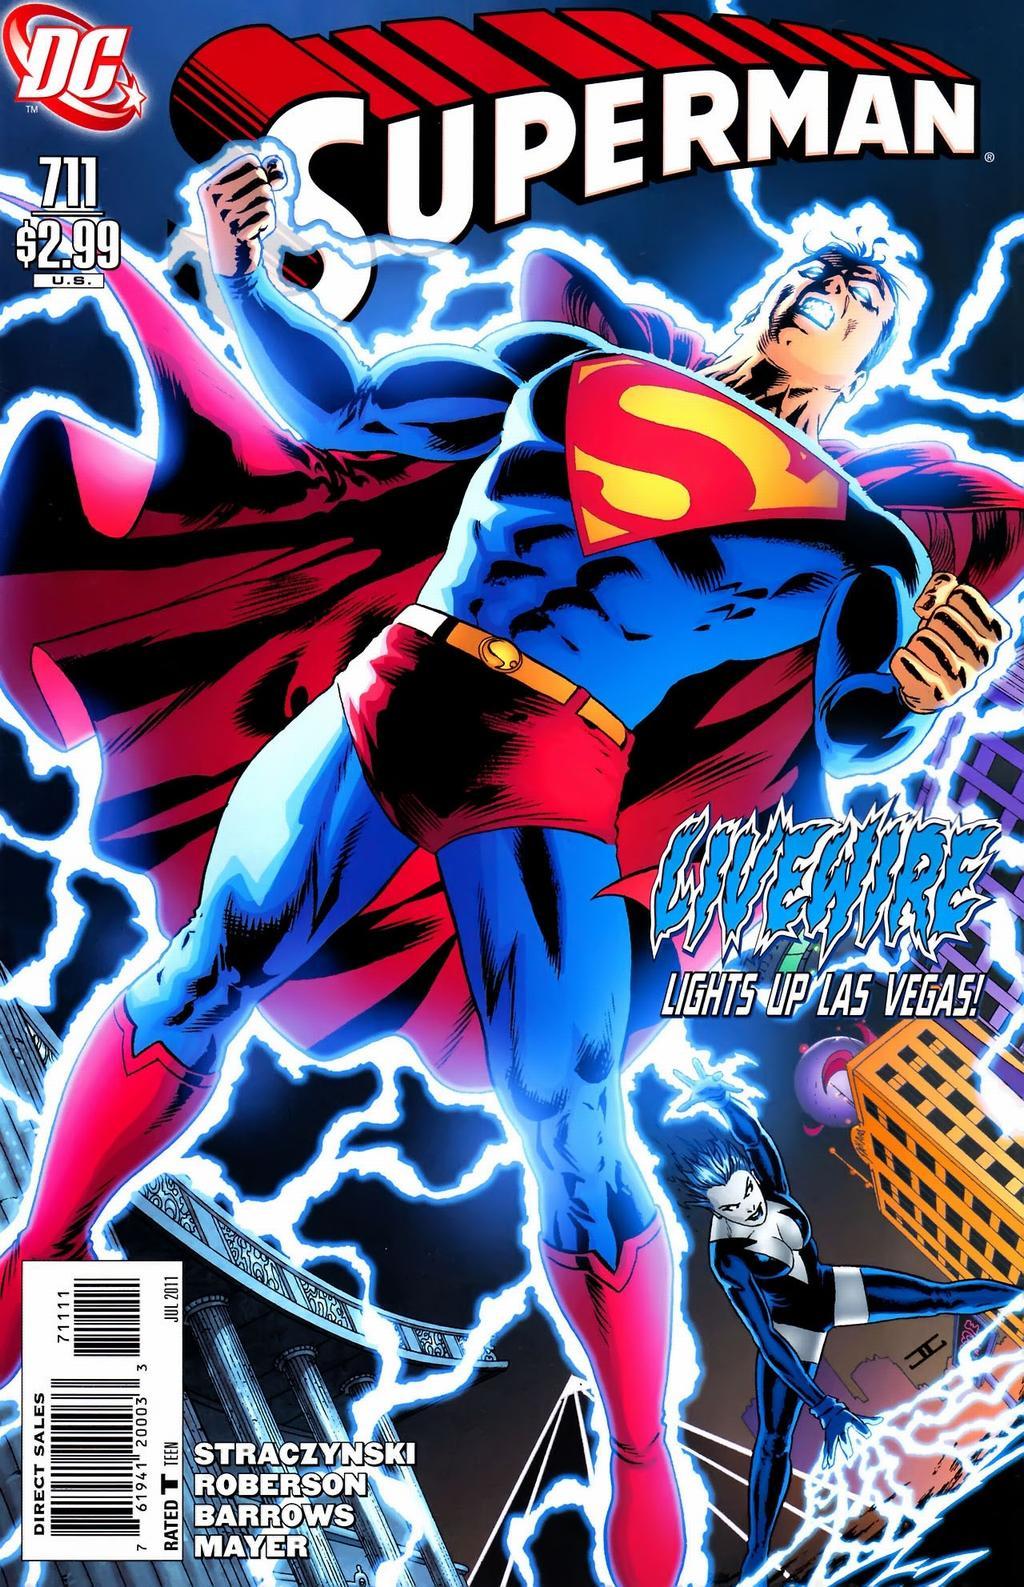 Superman Comic Book Cover Art : Superman comic book covers car interior design